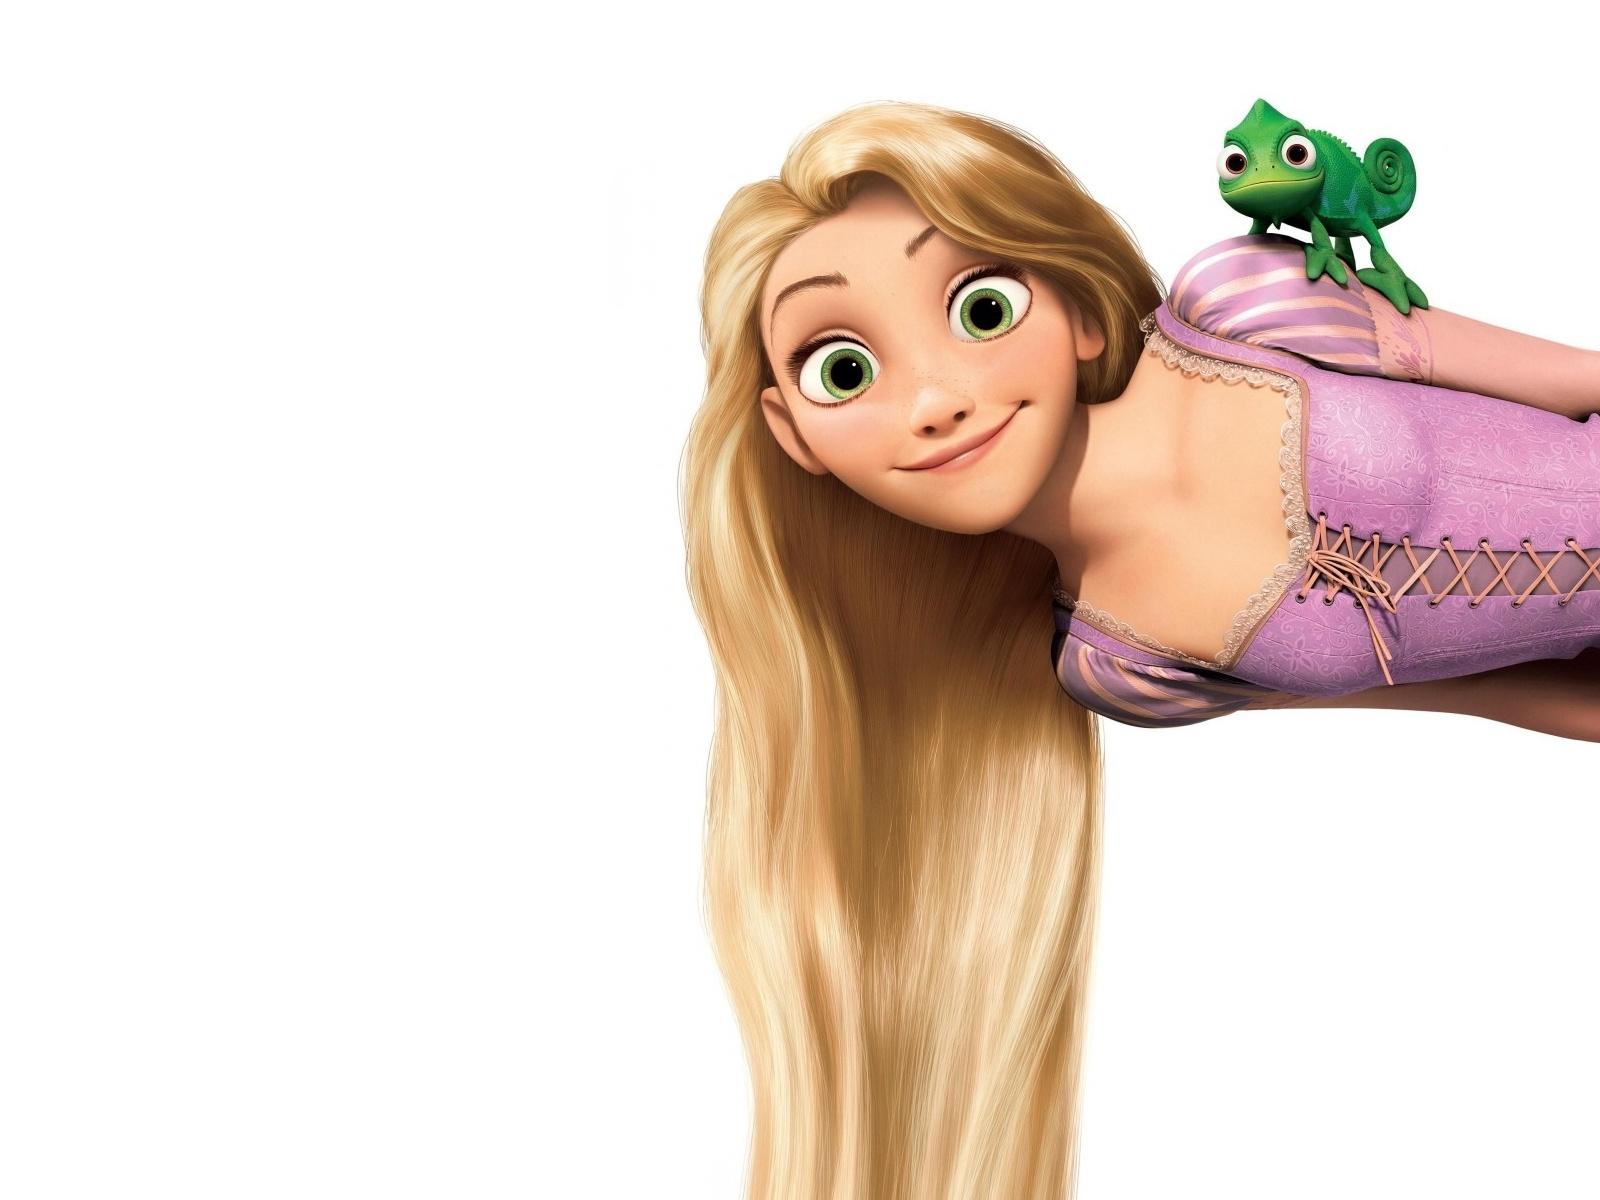 Datei:Rapunzel-pascal.jpg | Disney Wiki | Fandom powered